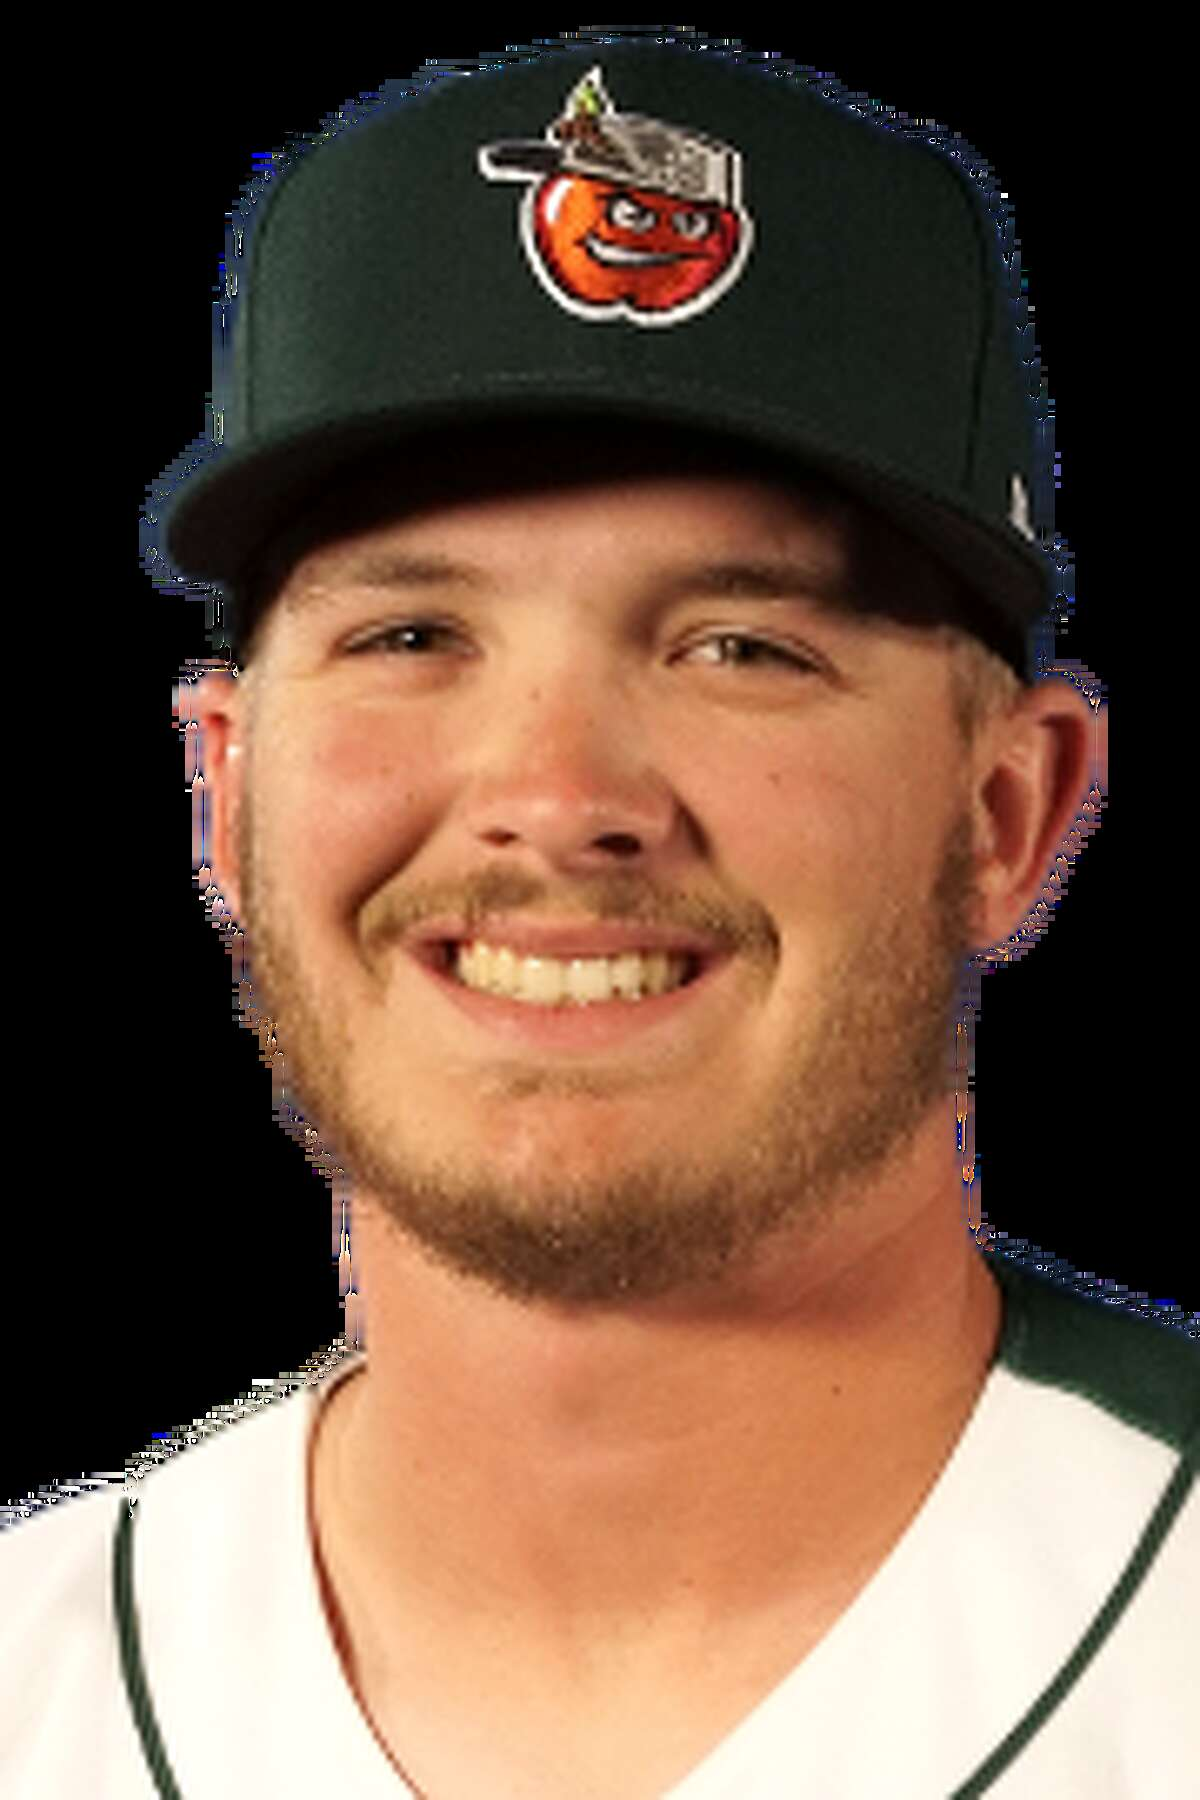 Fort Wayne TinCaps outfielder Grant Little